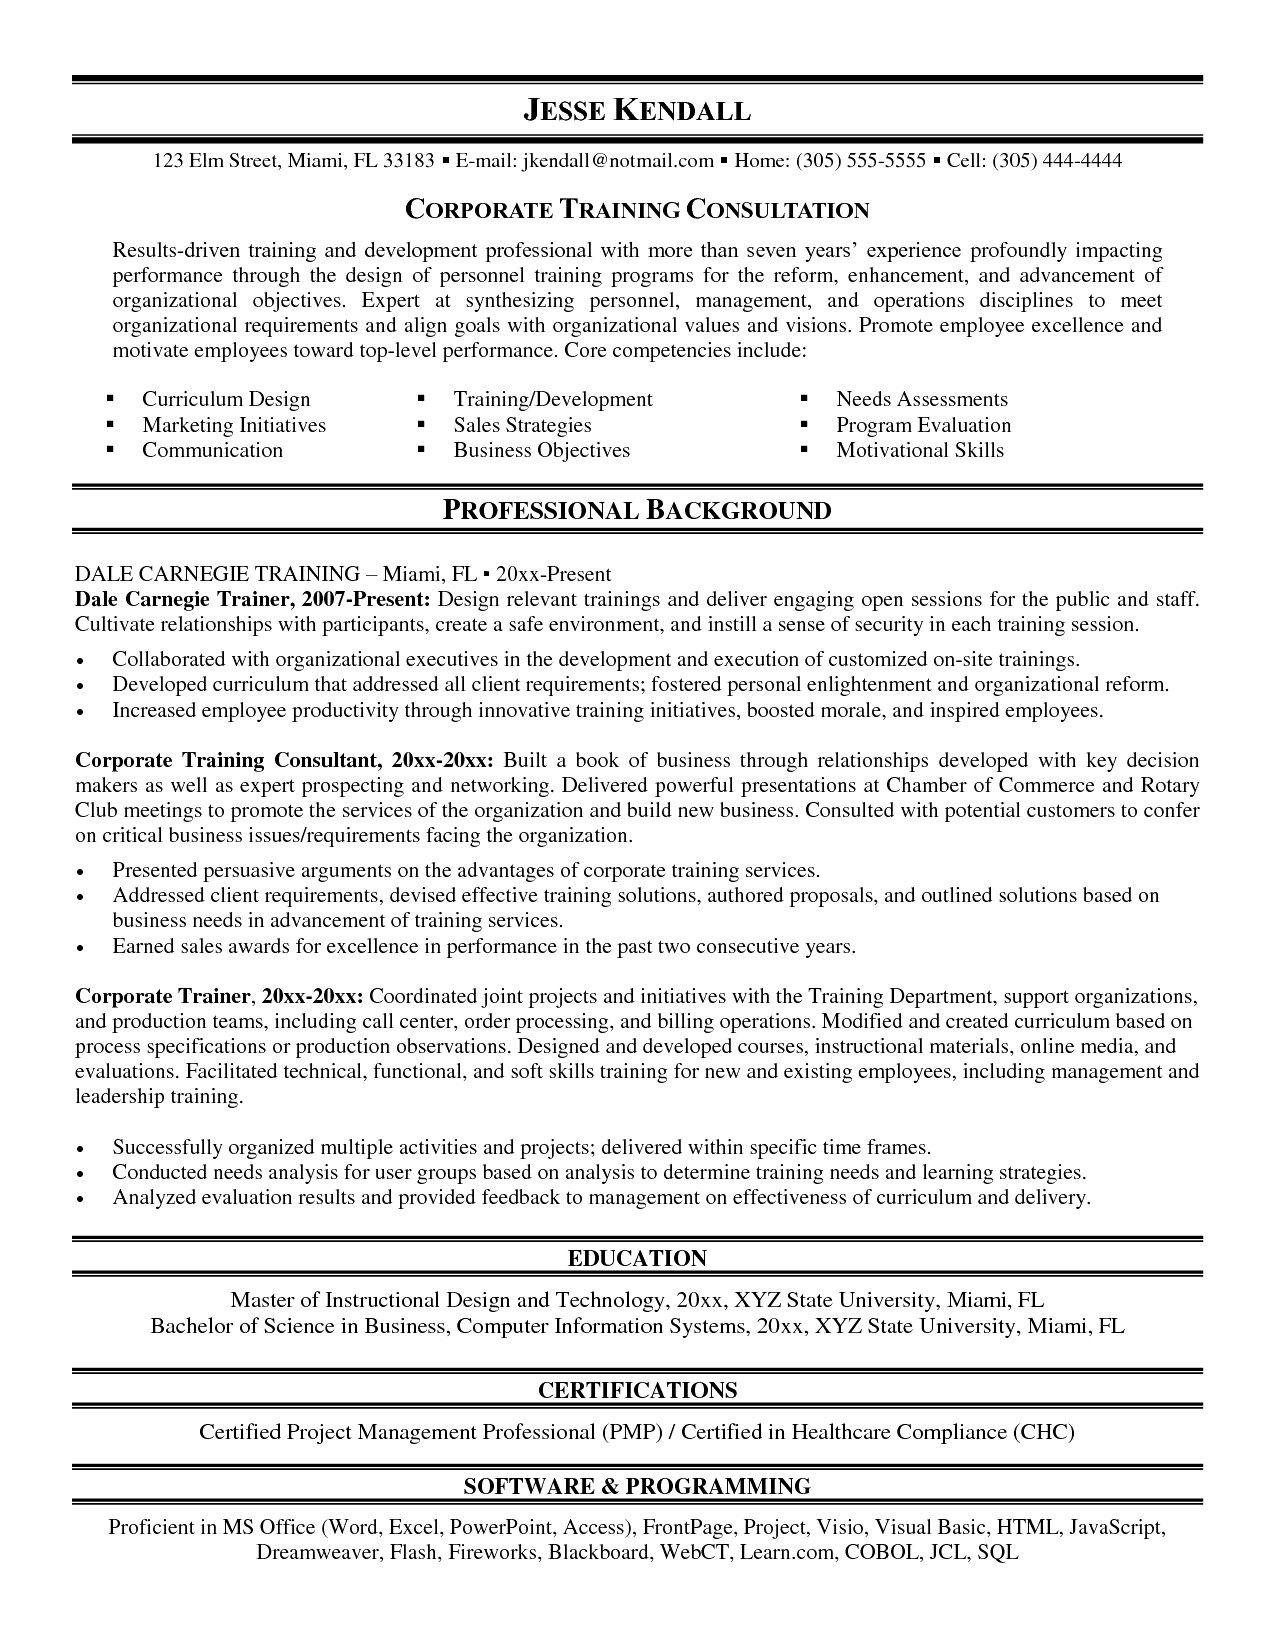 80 Unique Photos Of Resume Education Examples Associate's